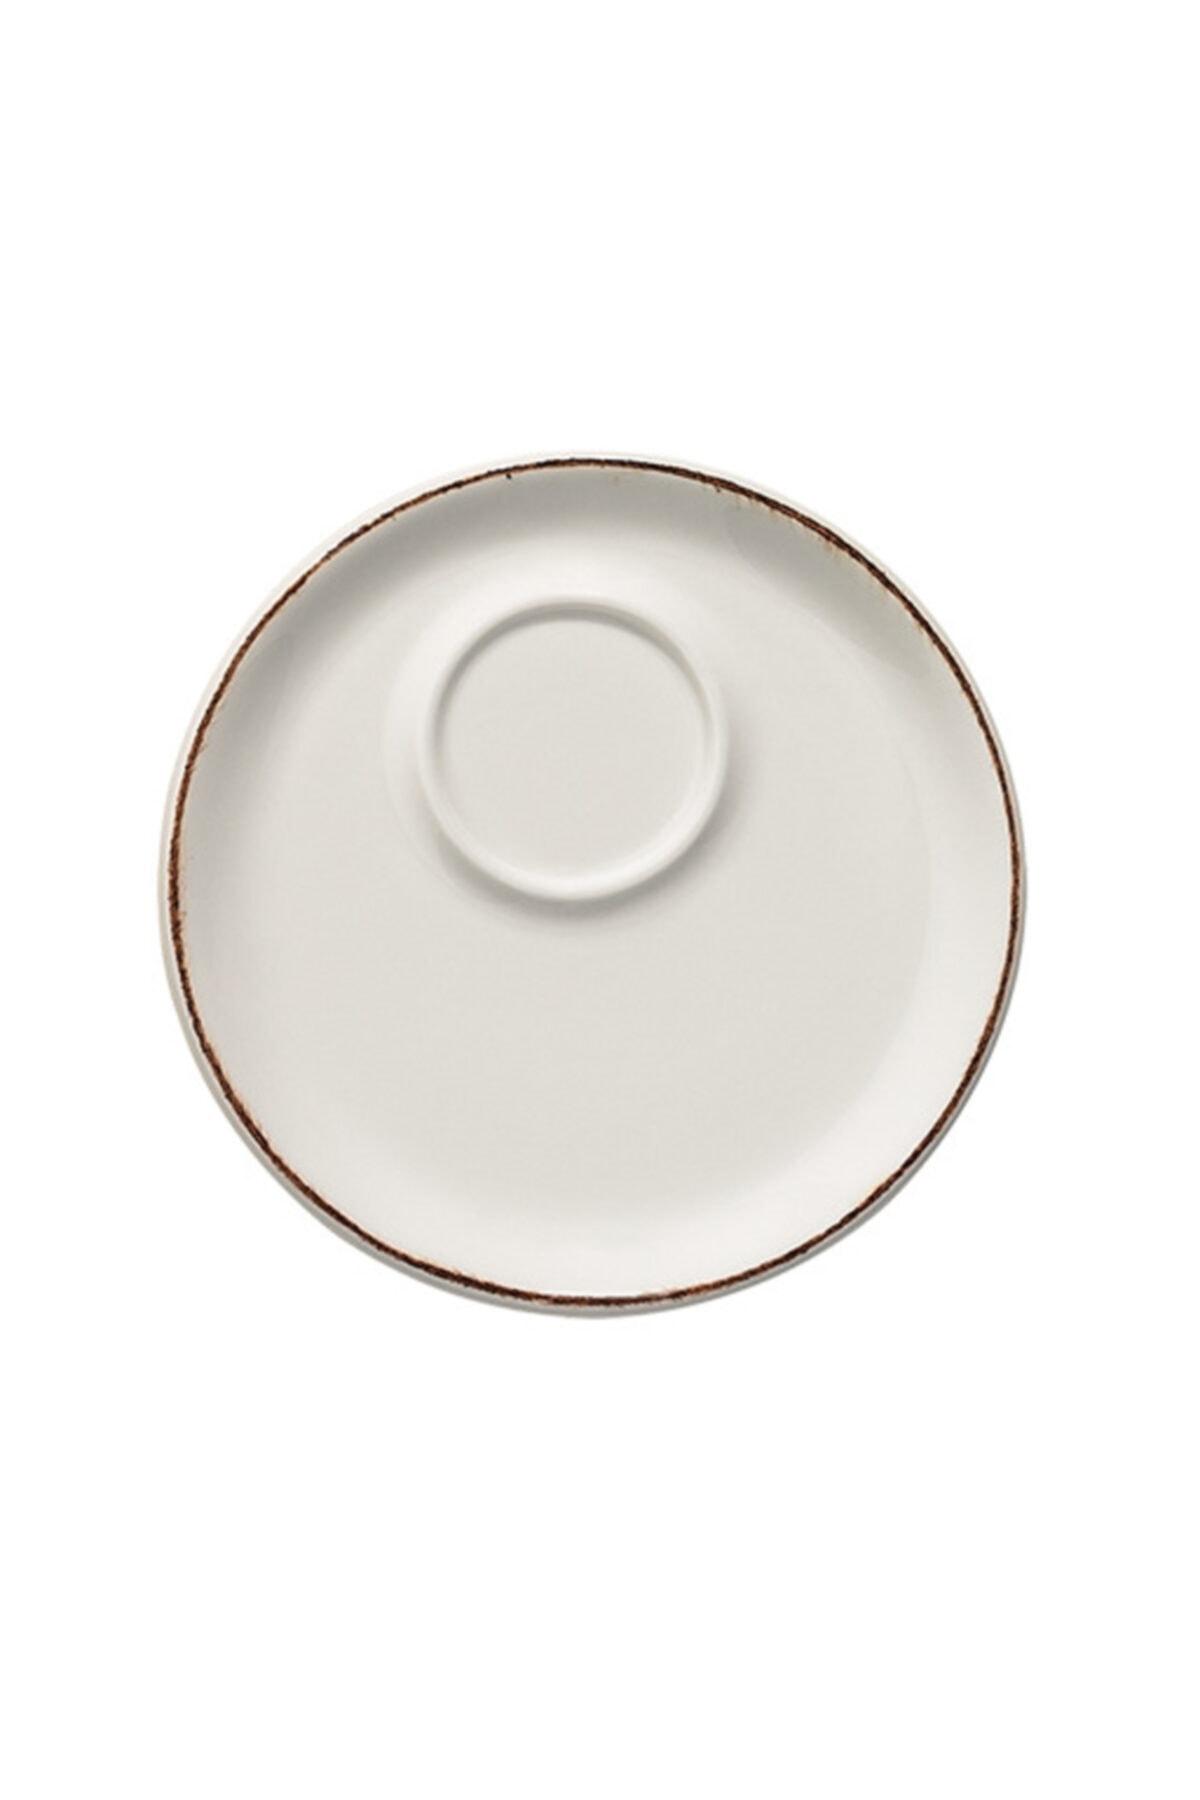 Bonna Porselen Retro Banquet Espresso Fincanı/Tabak 6'lı Takım 2